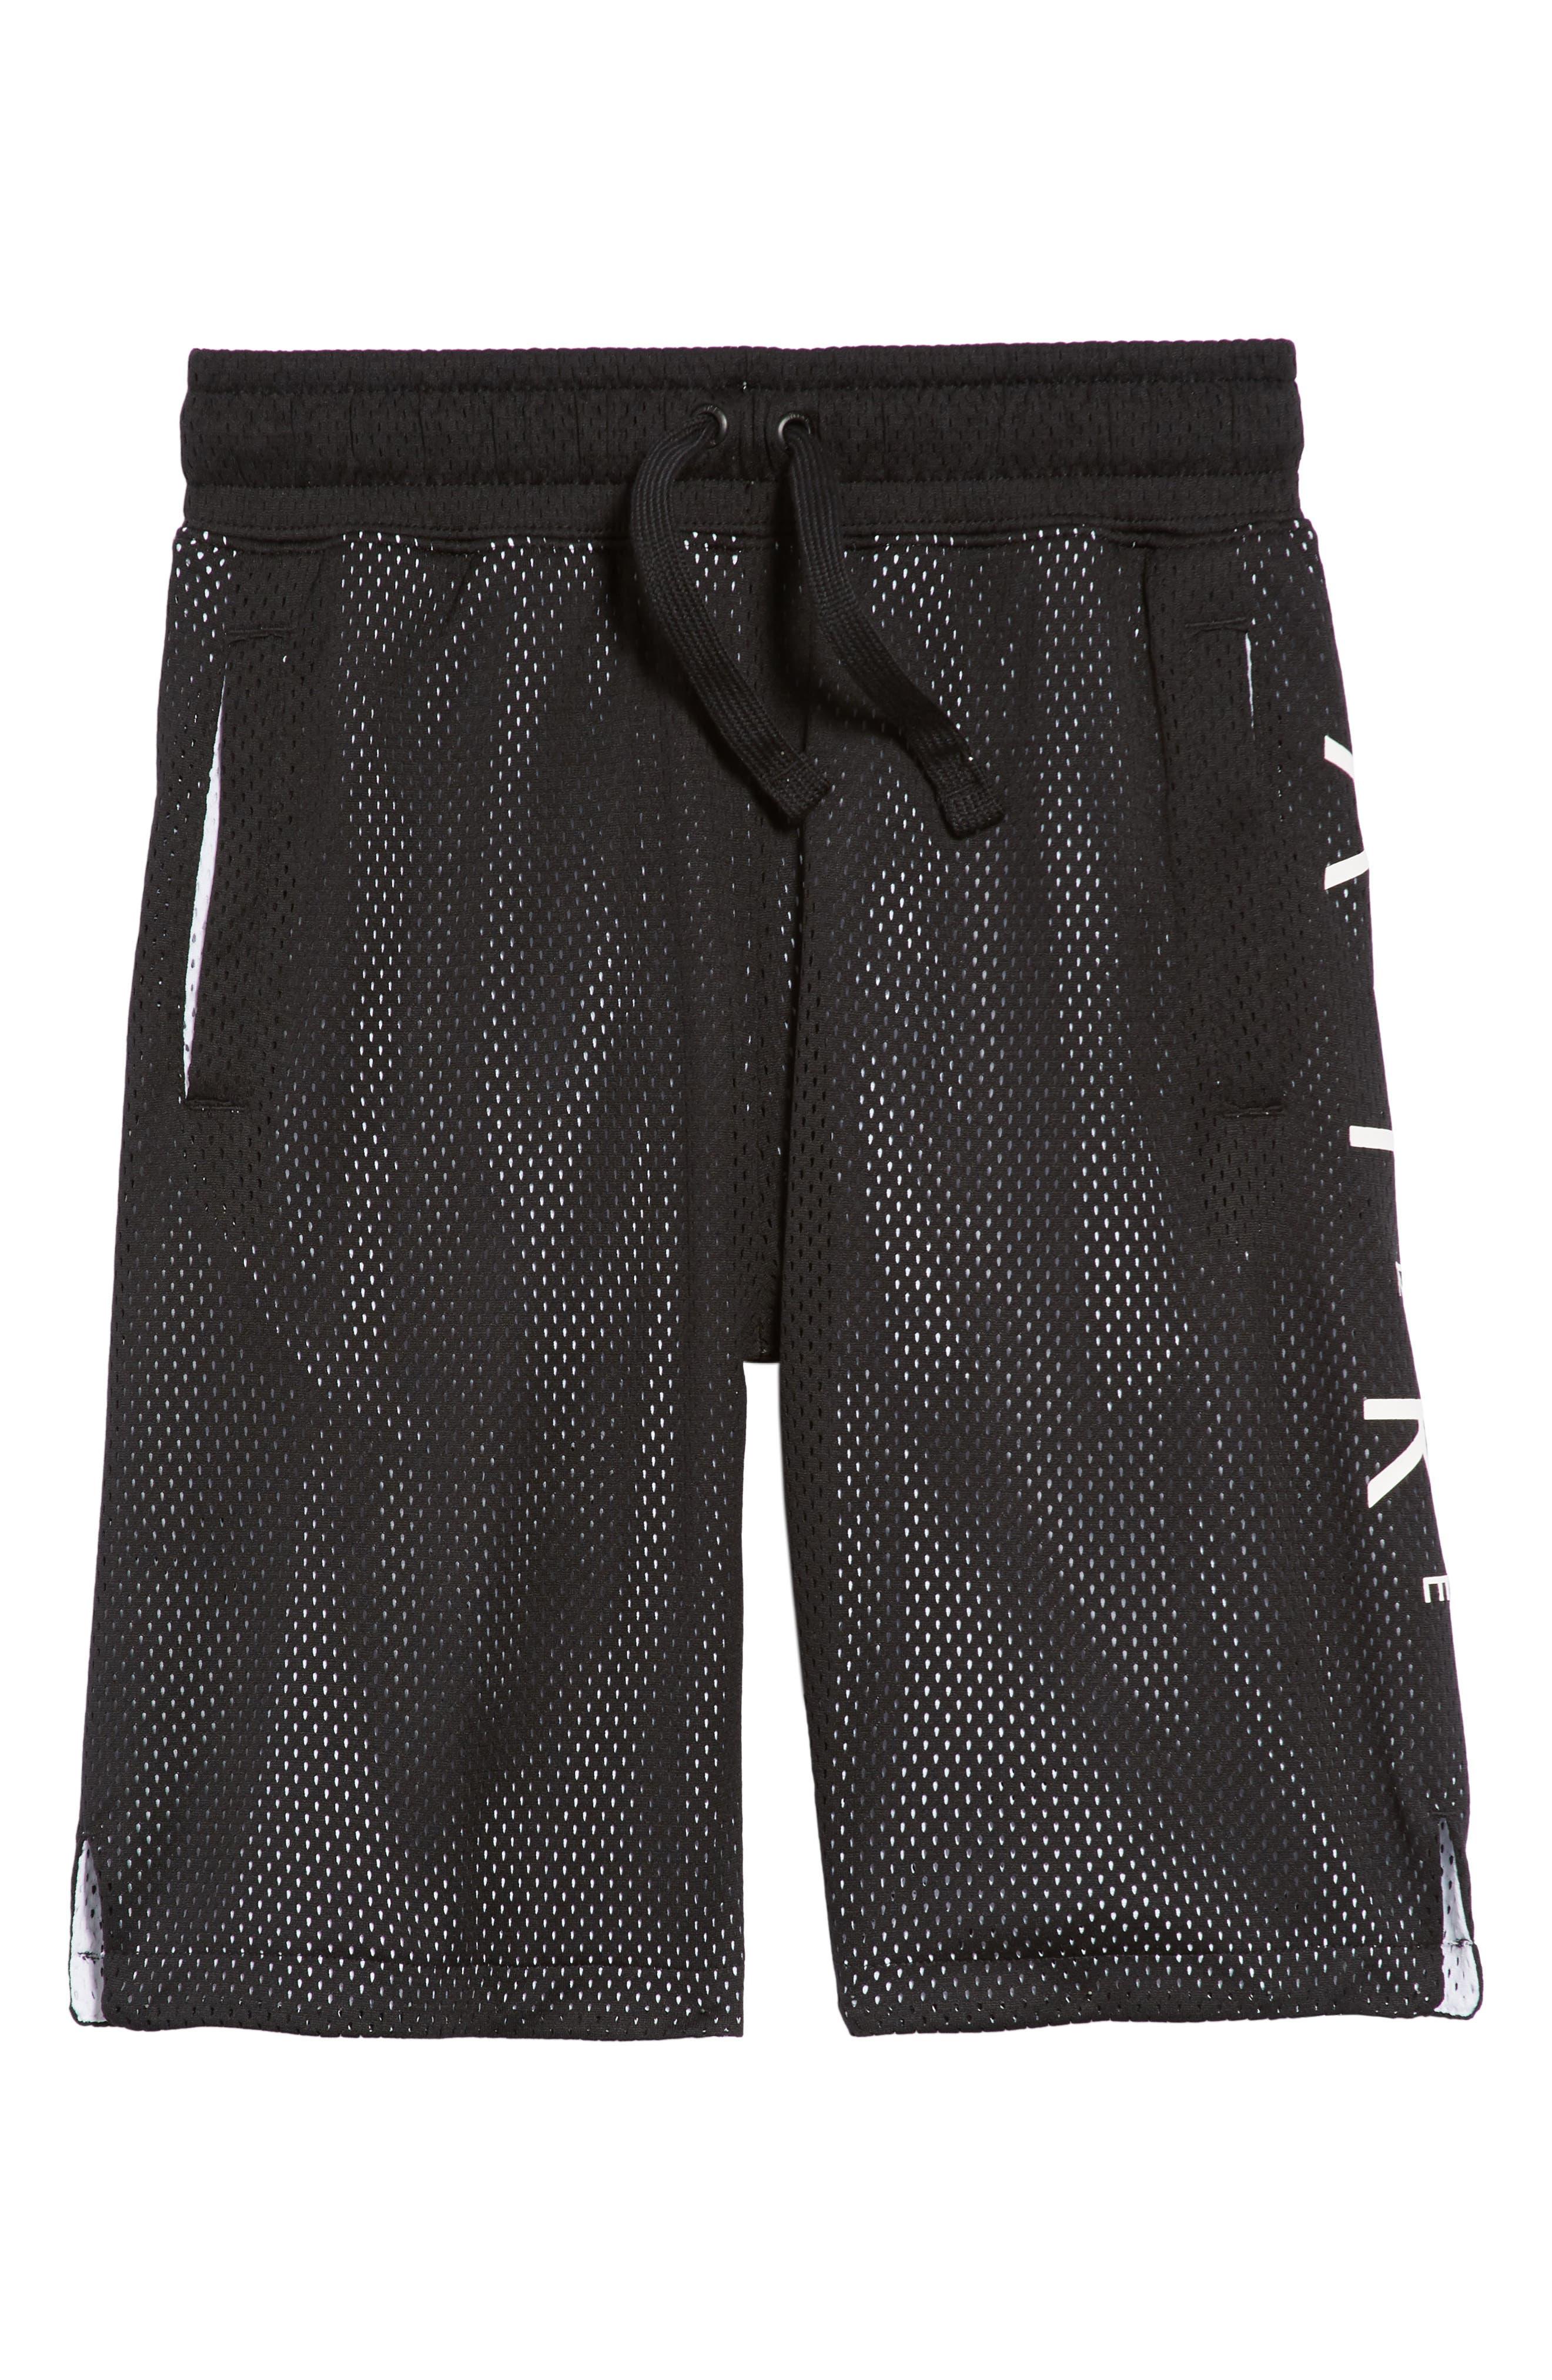 Sportswear Air Knit Shorts,                             Main thumbnail 1, color,                             Black/ White